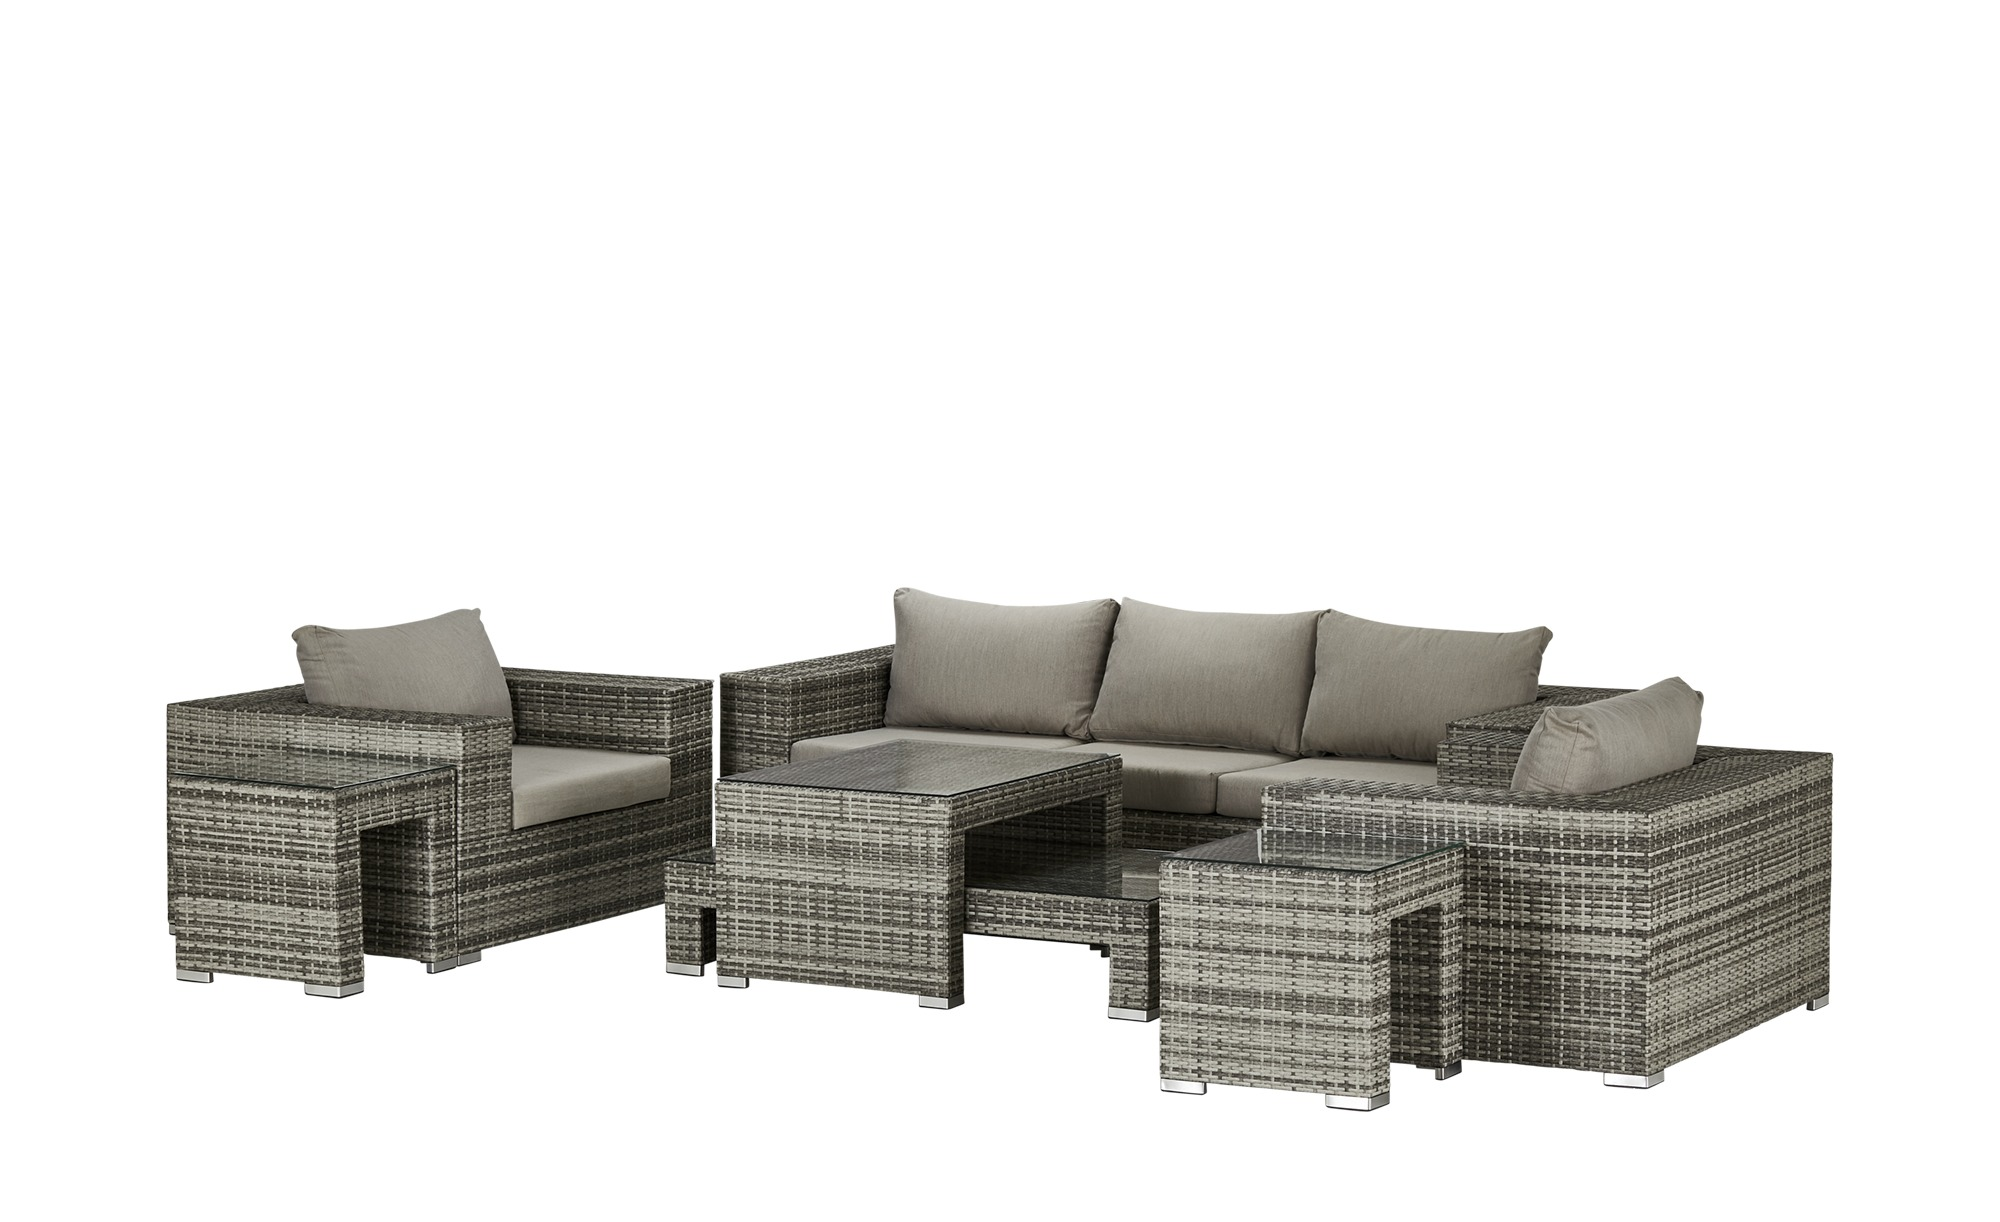 a casa mia Geflecht-Lounge  Milano ¦ grau ¦ Stahl pulverbeschichtet/PE-Geflecht Garten > Gartenmöbel nach Materialien > Polyrattan-Gartenmöbel - Höffner